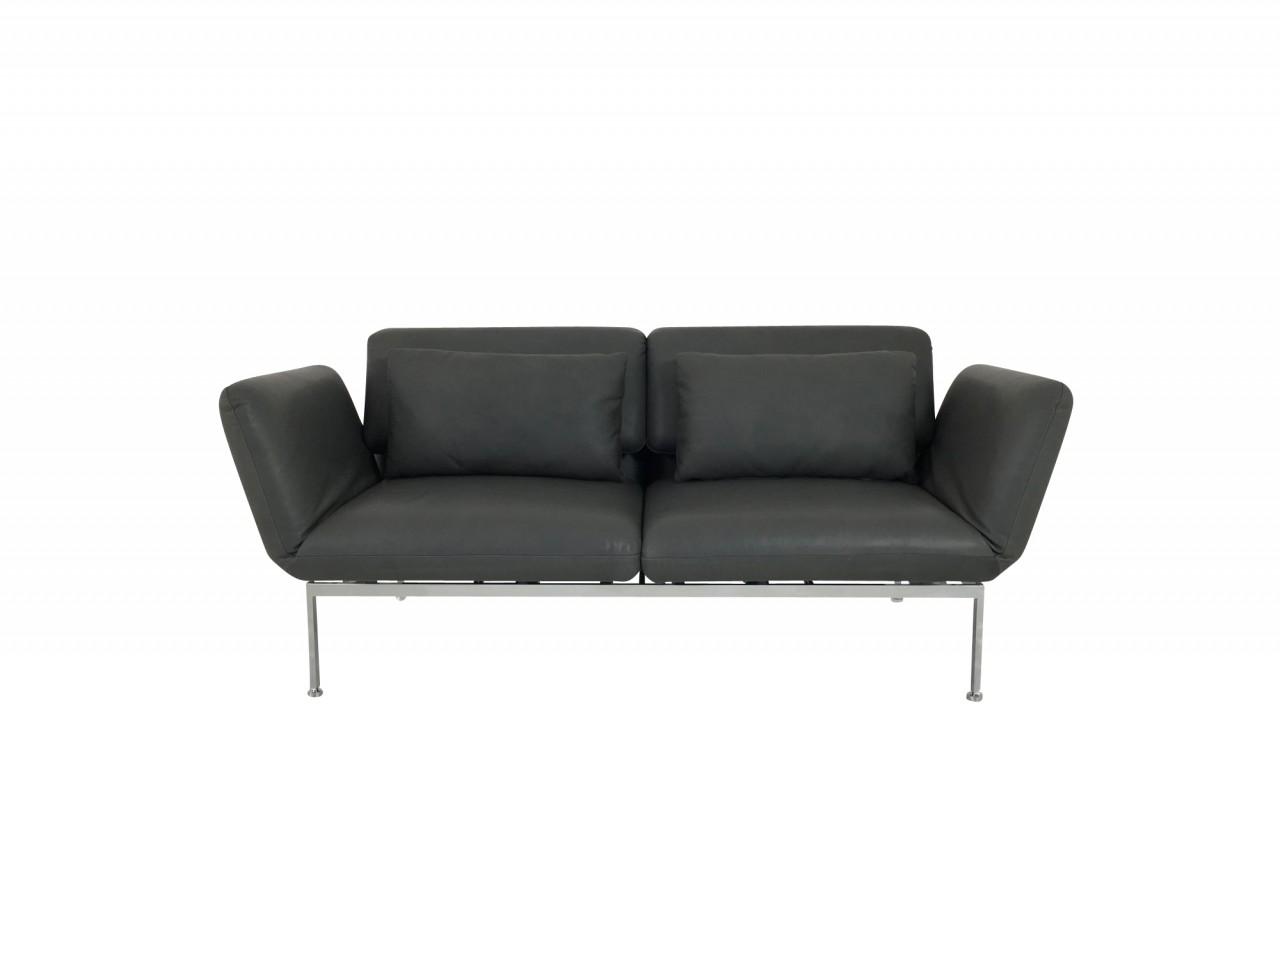 br hl roro medium sofa im anilin leder pearl leder grau. Black Bedroom Furniture Sets. Home Design Ideas